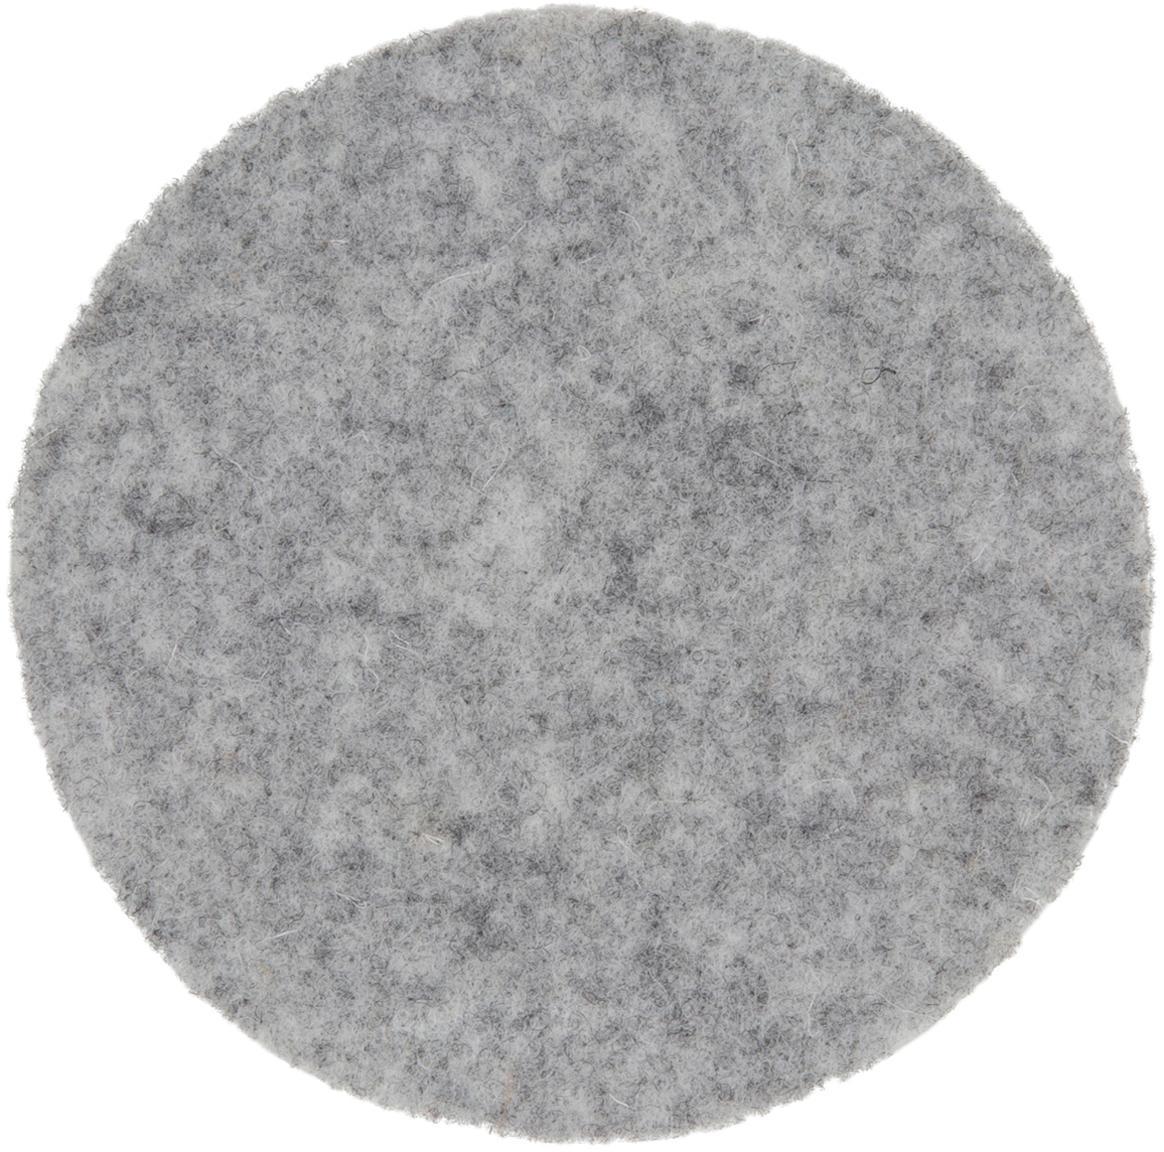 Posavasos de fieltro Leandra, 6uds., 90% lana, 10% polietileno, Gris claro, Ø 10 cm